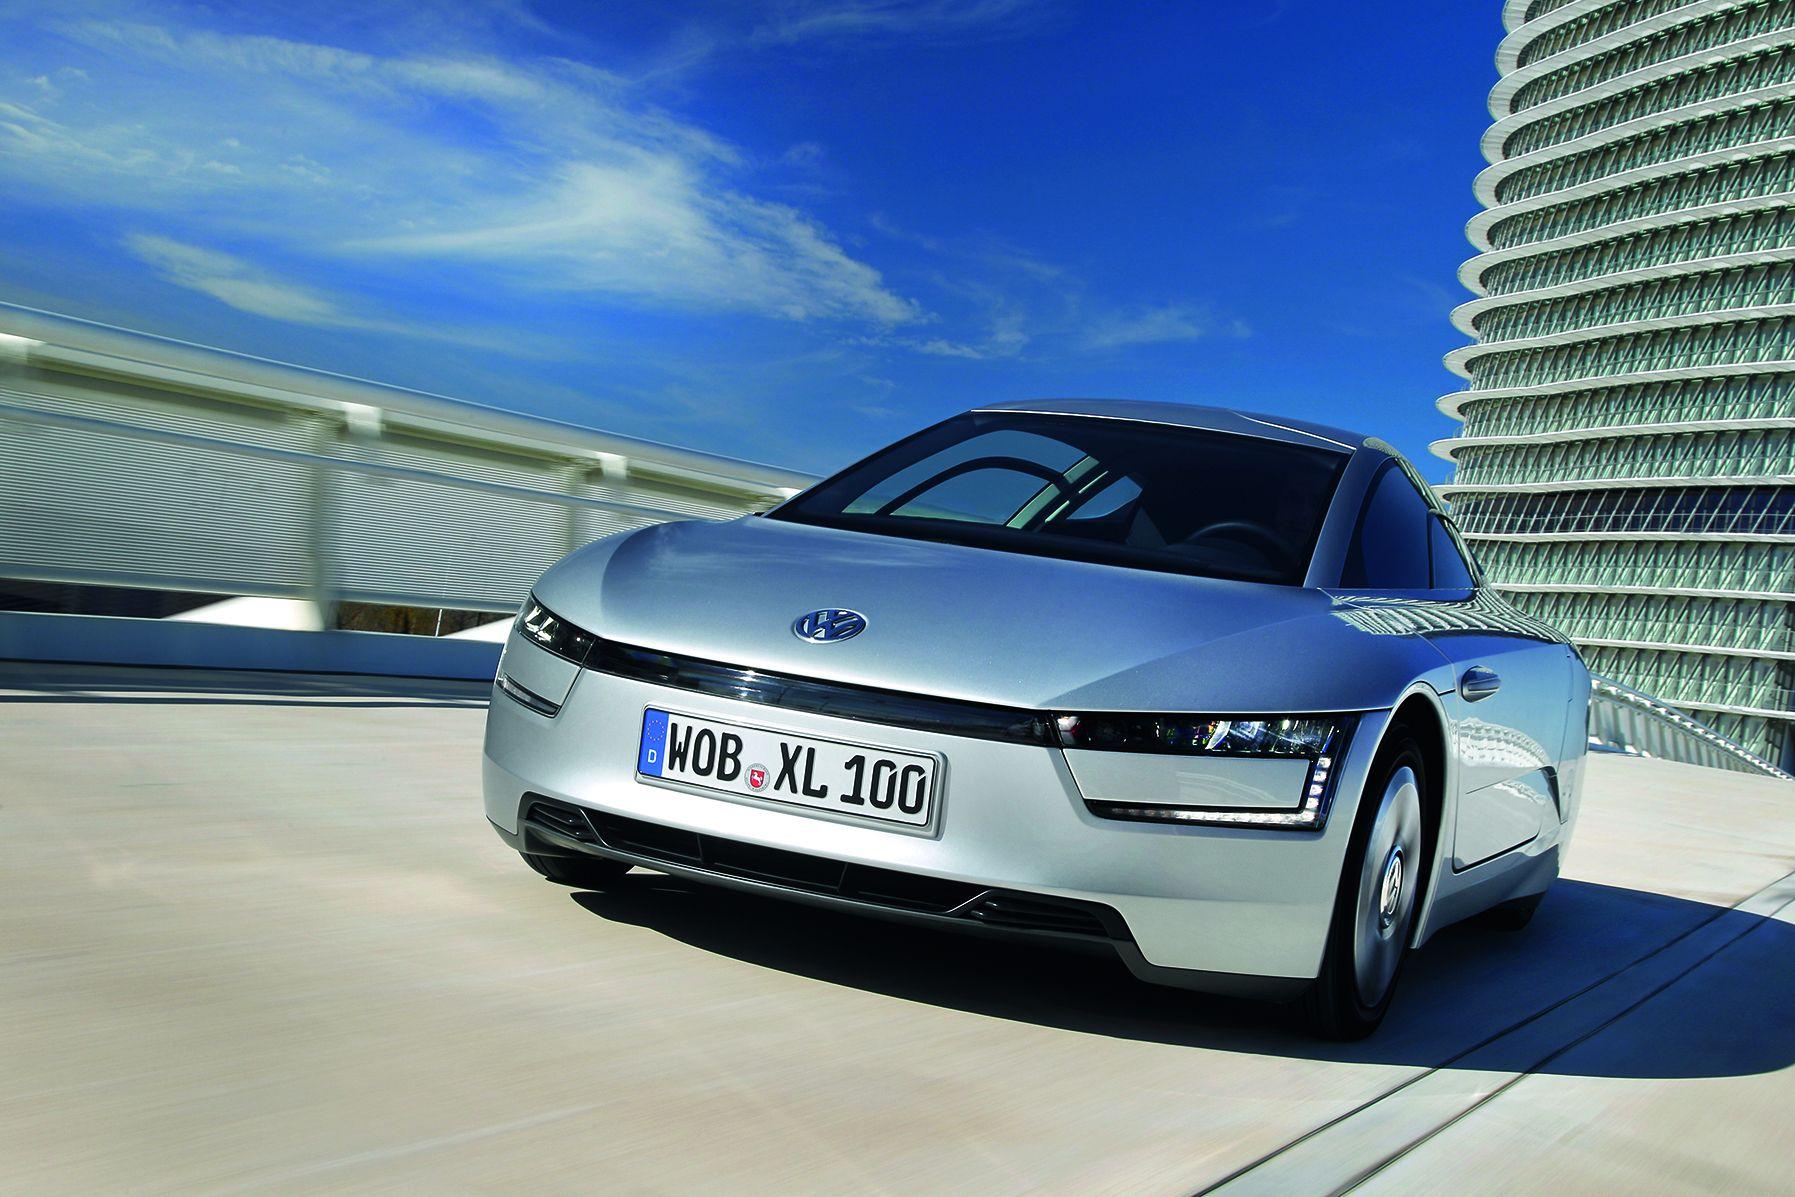 Volkswagen Xl1 The Most Aerodynamic Car Ever Vw Volkswagen